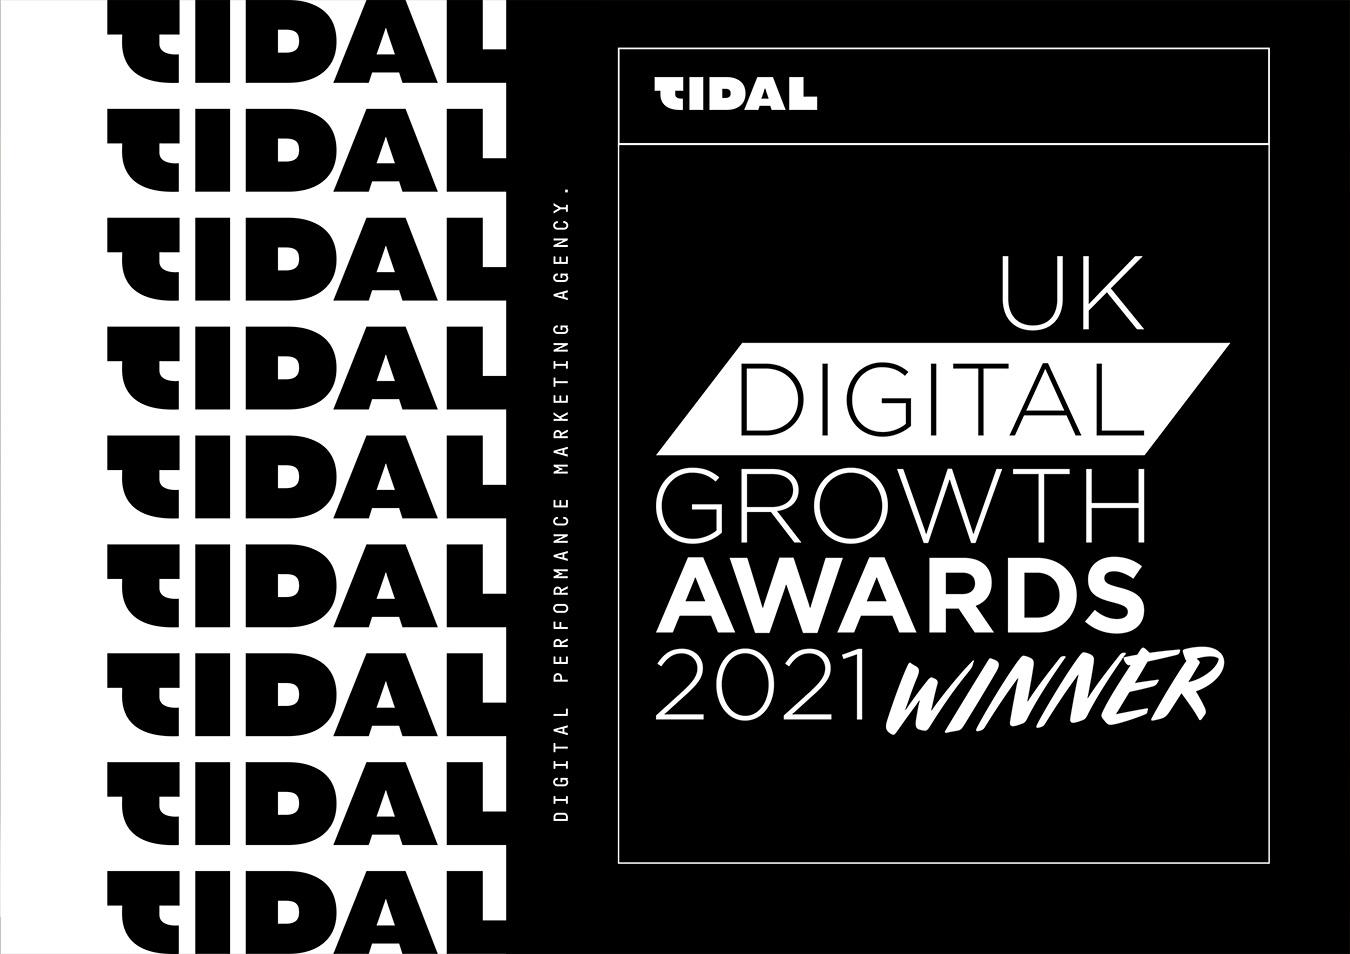 UK Digital Growth Awards 2021 Winners